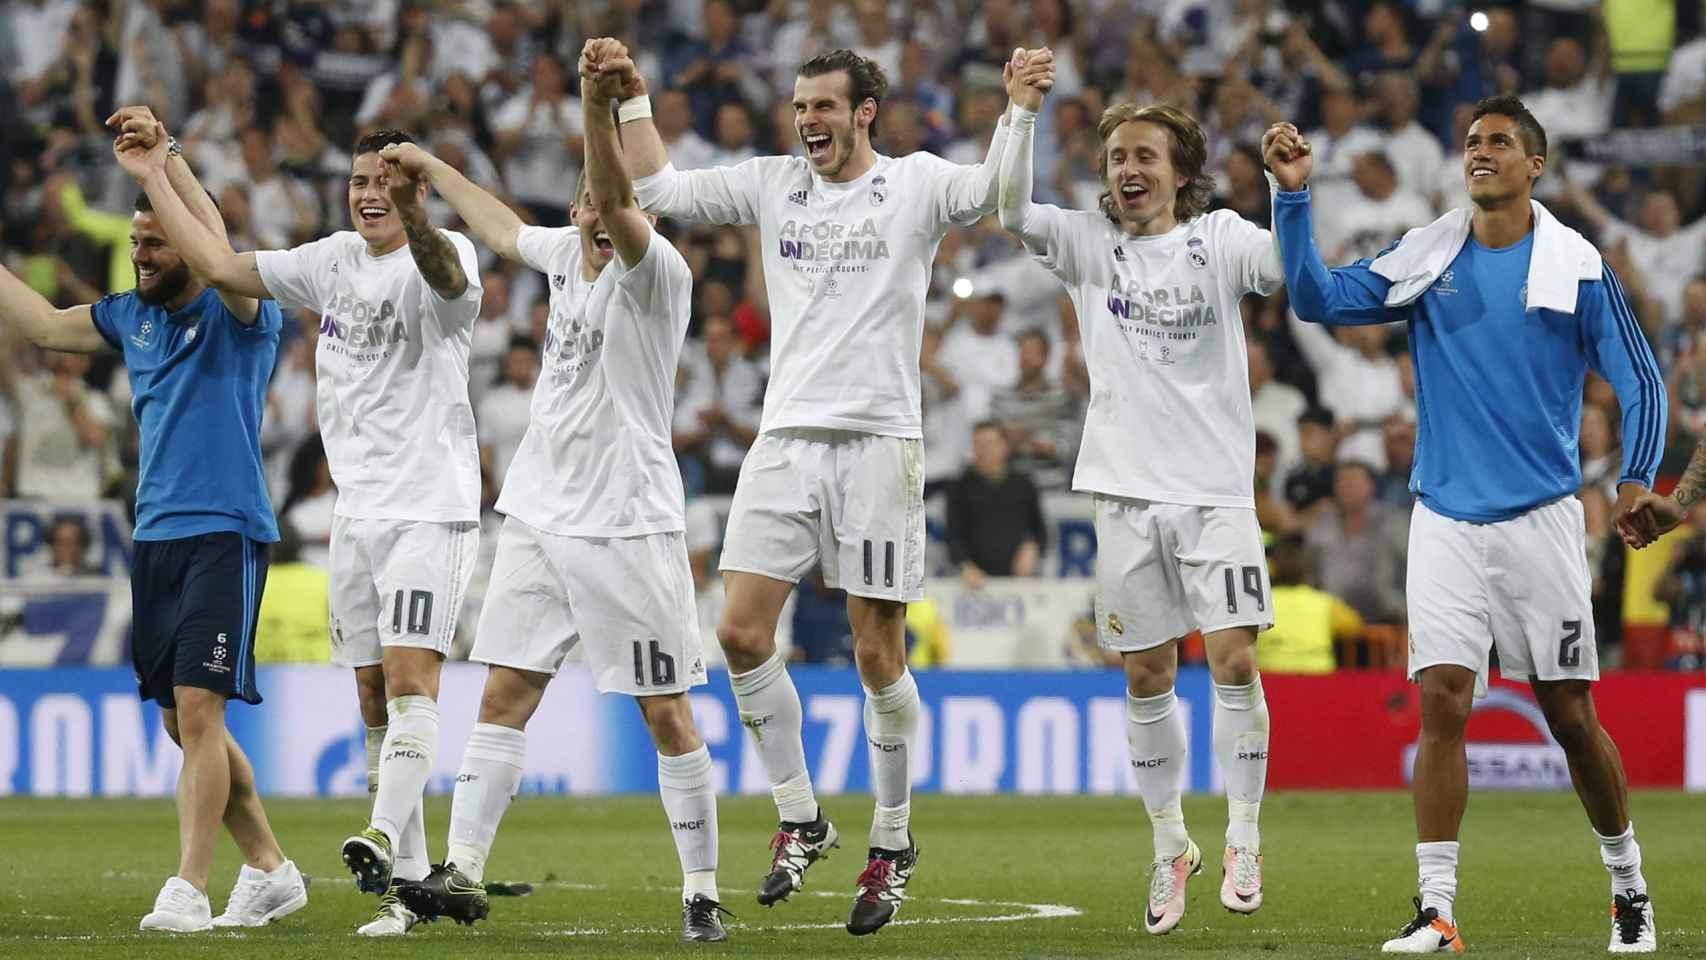 Jugadores del Real Madrid celebran el pase a la final de Champions.